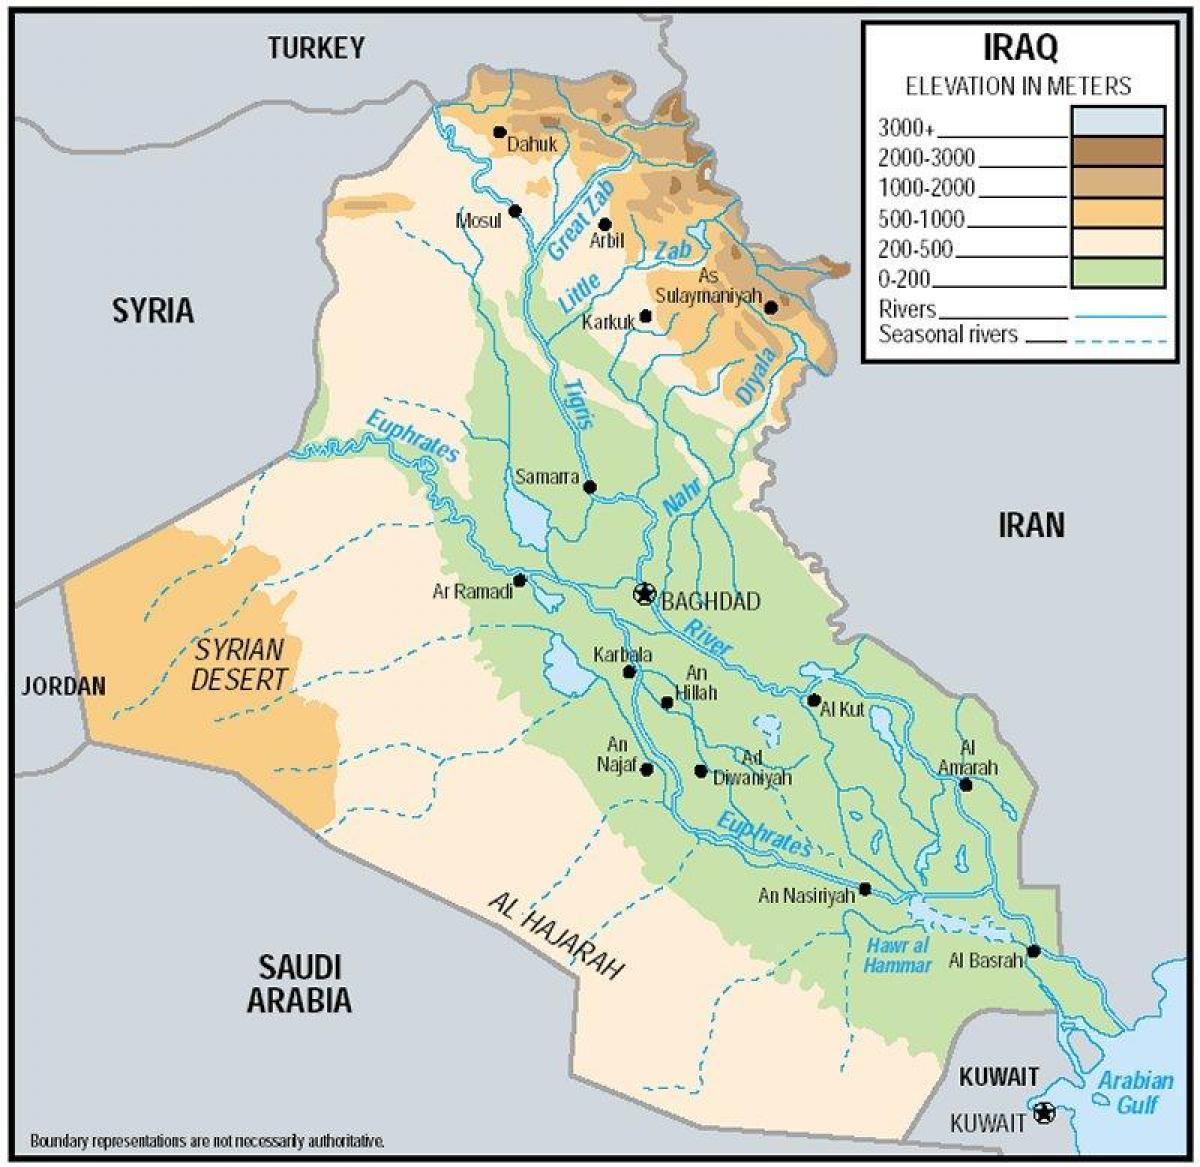 Irak Vyskova Mapa Mapa Iraku Nadmorska Vyska Zapadni Asie Asie